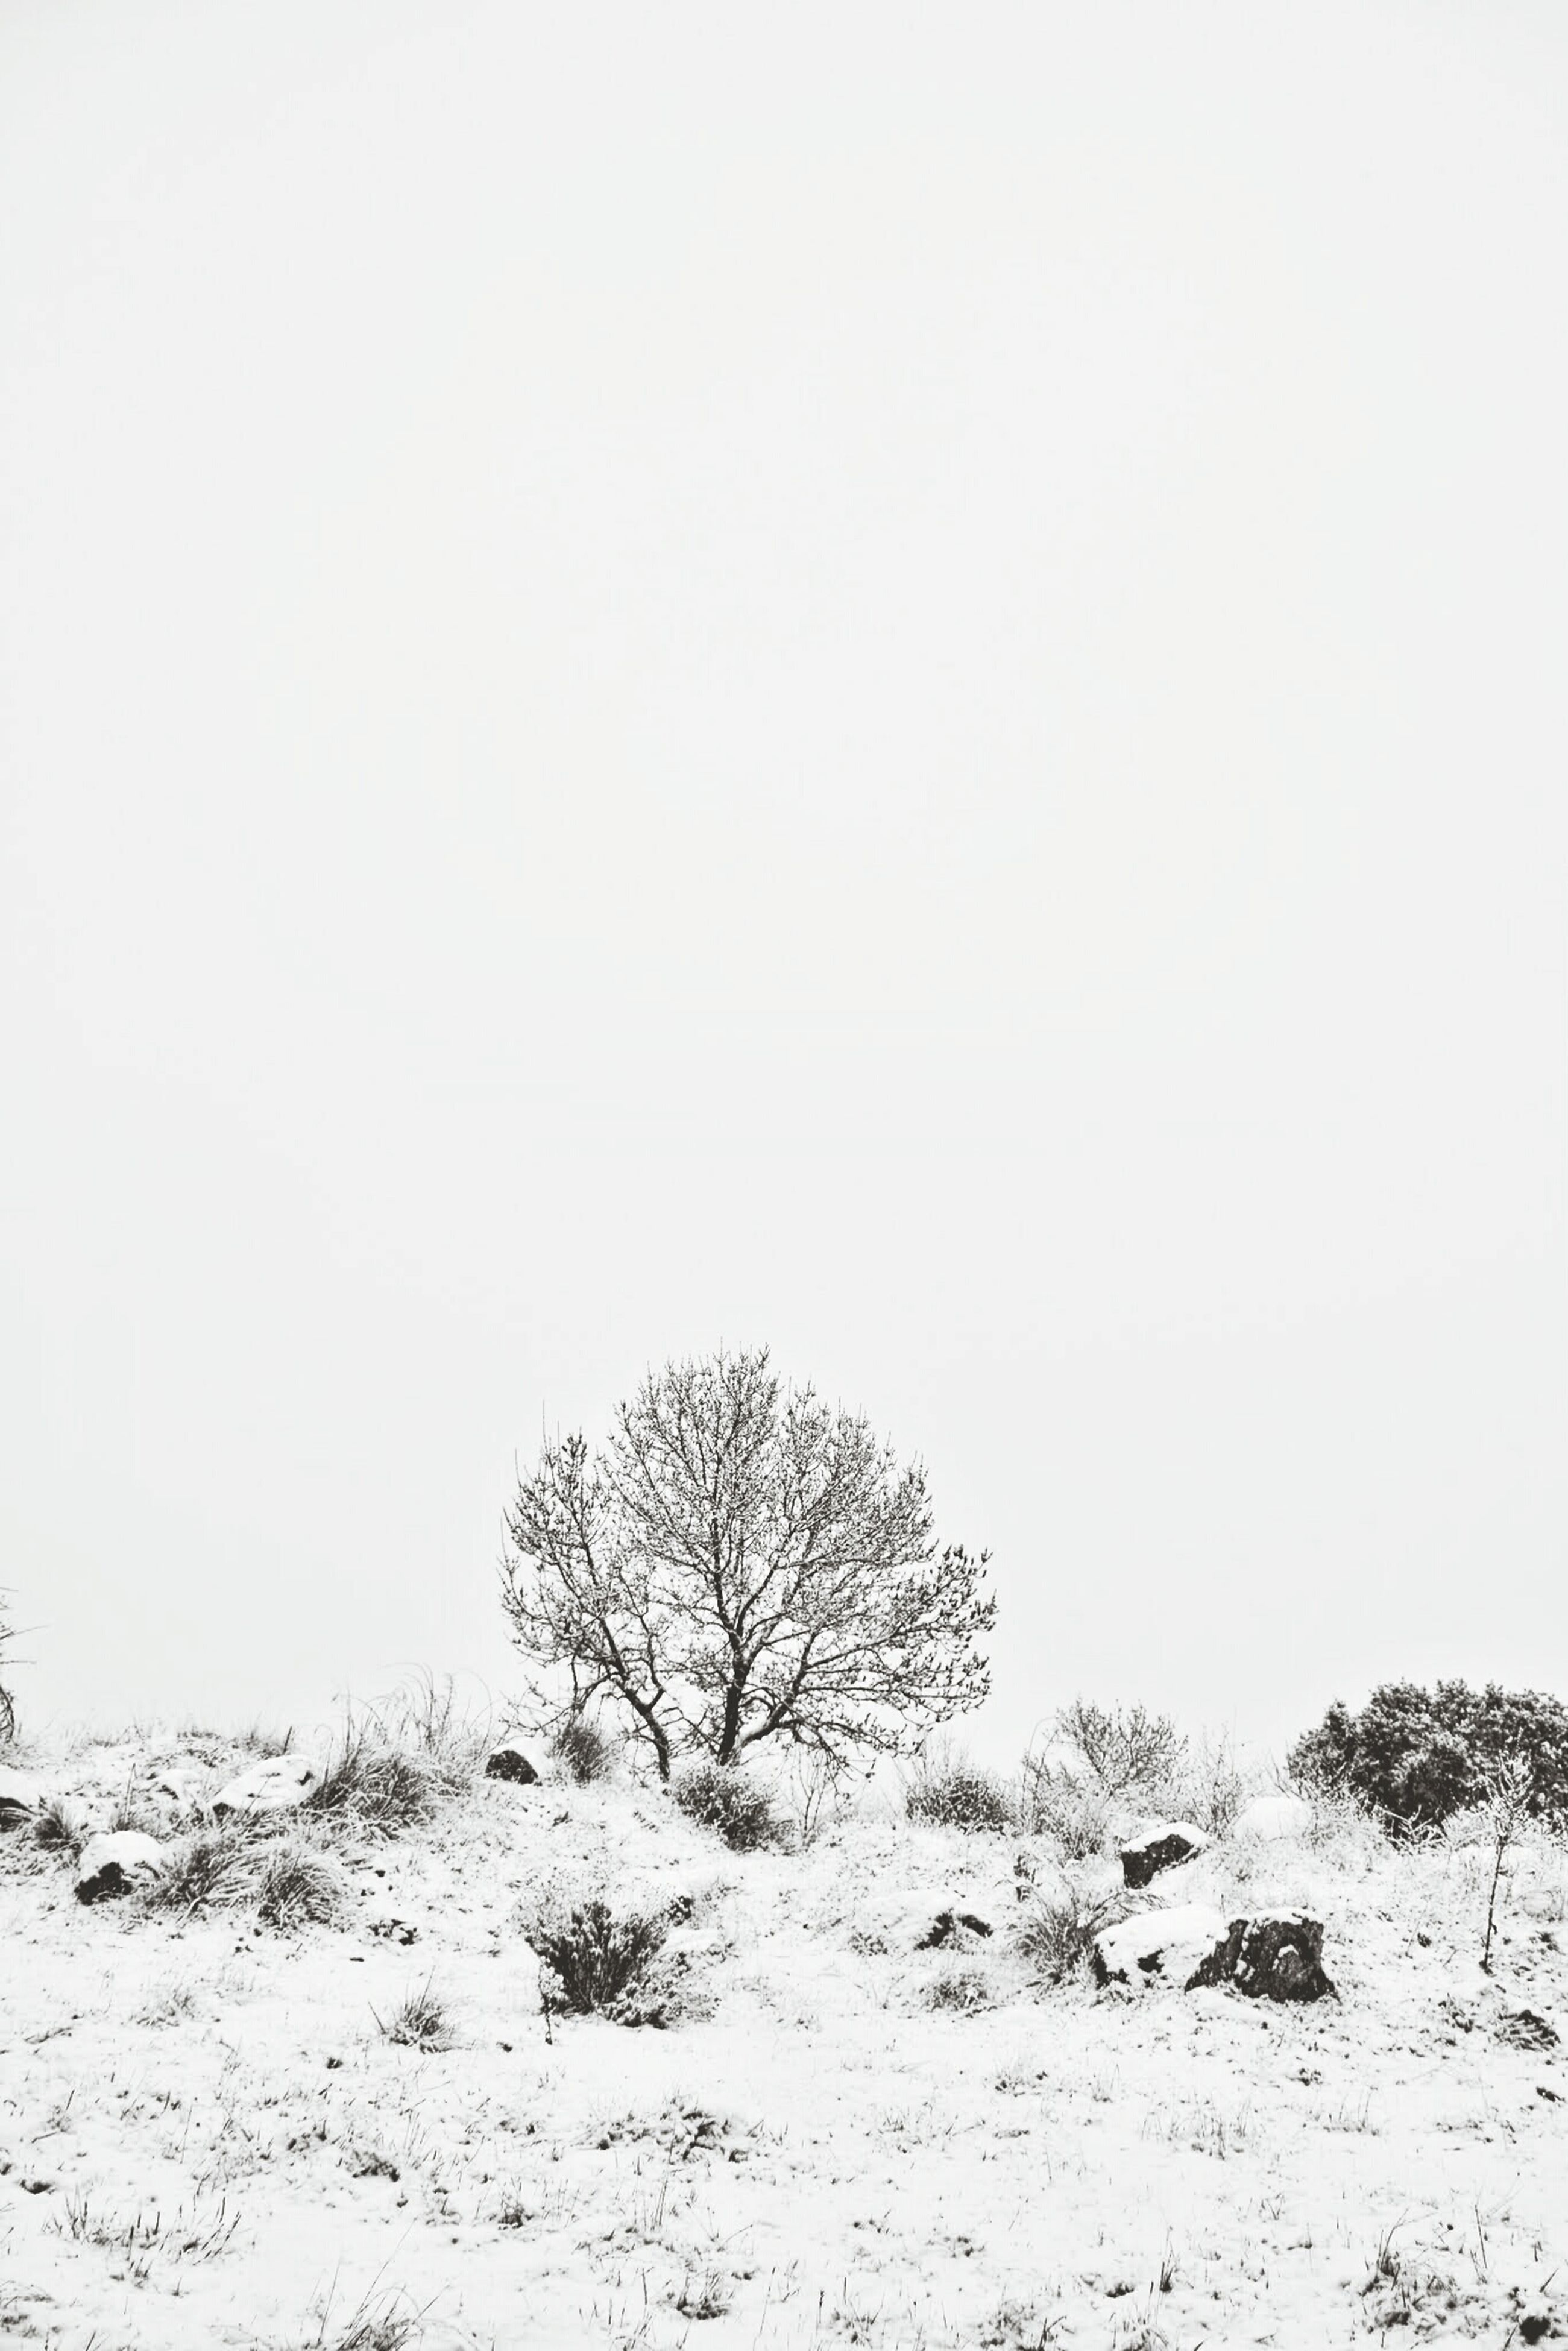 clear sky, copy space, tranquility, tranquil scene, landscape, tree, nature, scenics, beauty in nature, snow, non-urban scene, winter, cold temperature, sand, field, remote, day, non urban scene, outdoors, desert